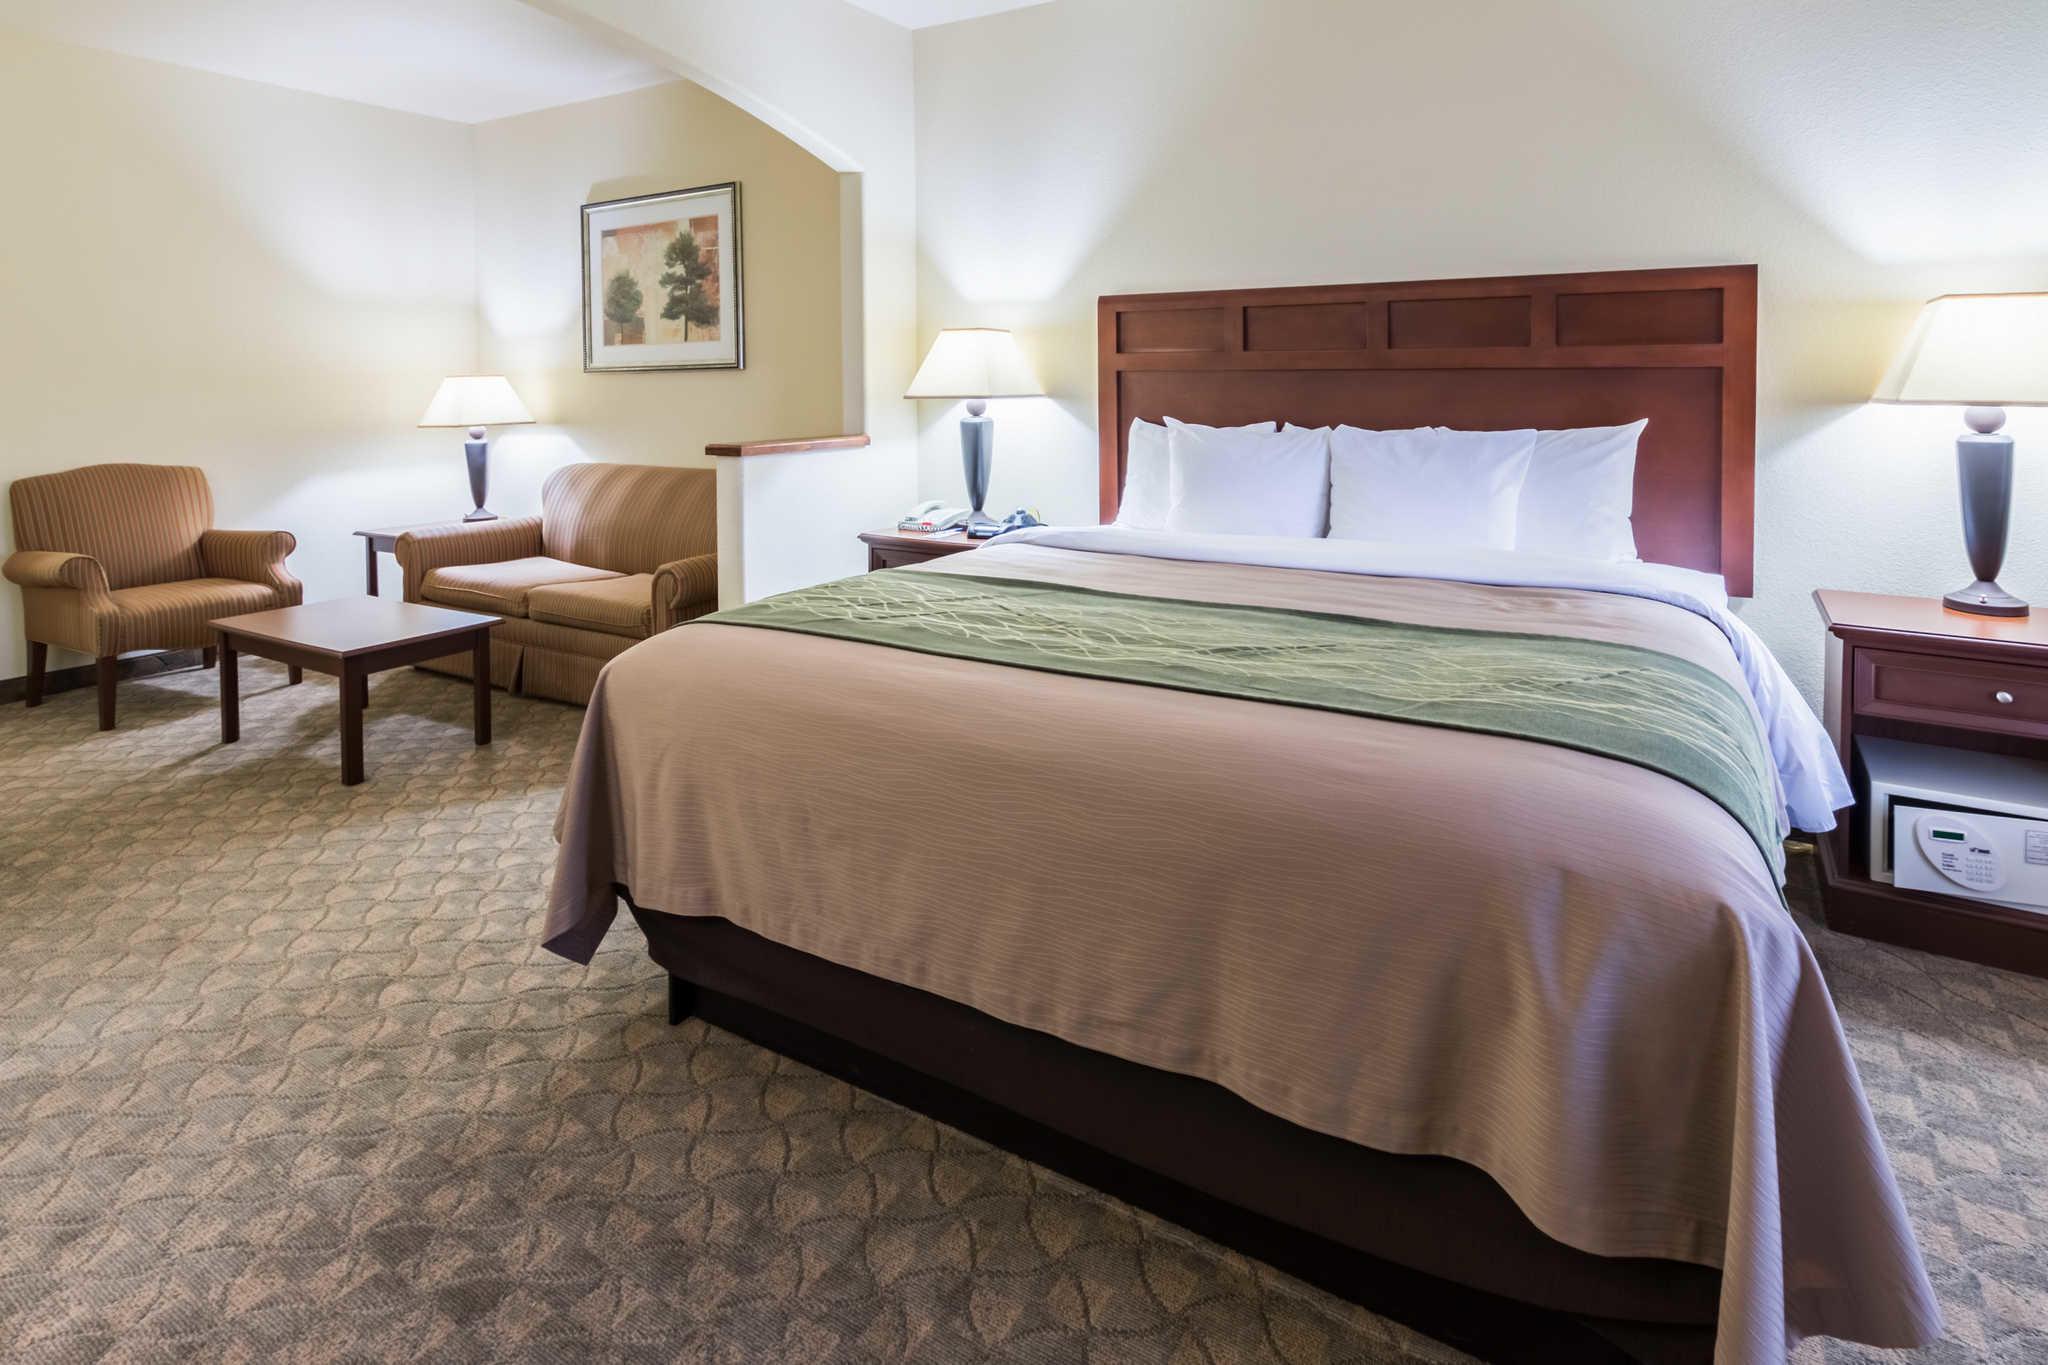 Comfort Inn Amp Suites Near Comanche Peak In Glen Rose Tx